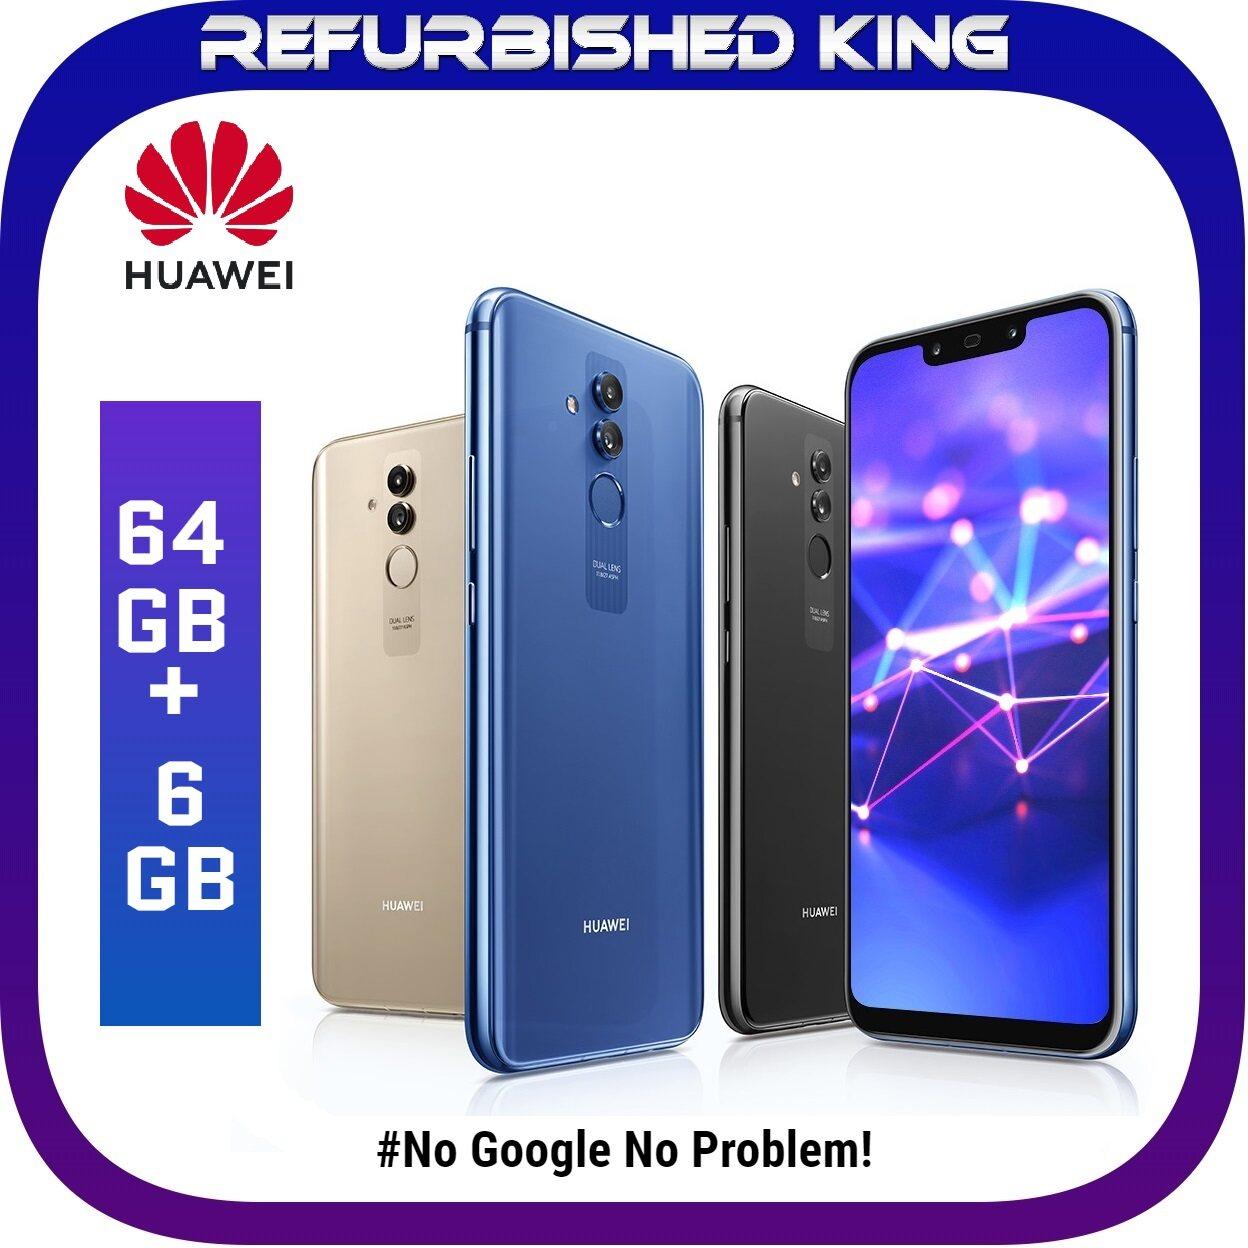 Original Huawei Mate 20 Lite [64GB + 6GB RAM] Display Unit 98% Like New [1 Month Warranty]